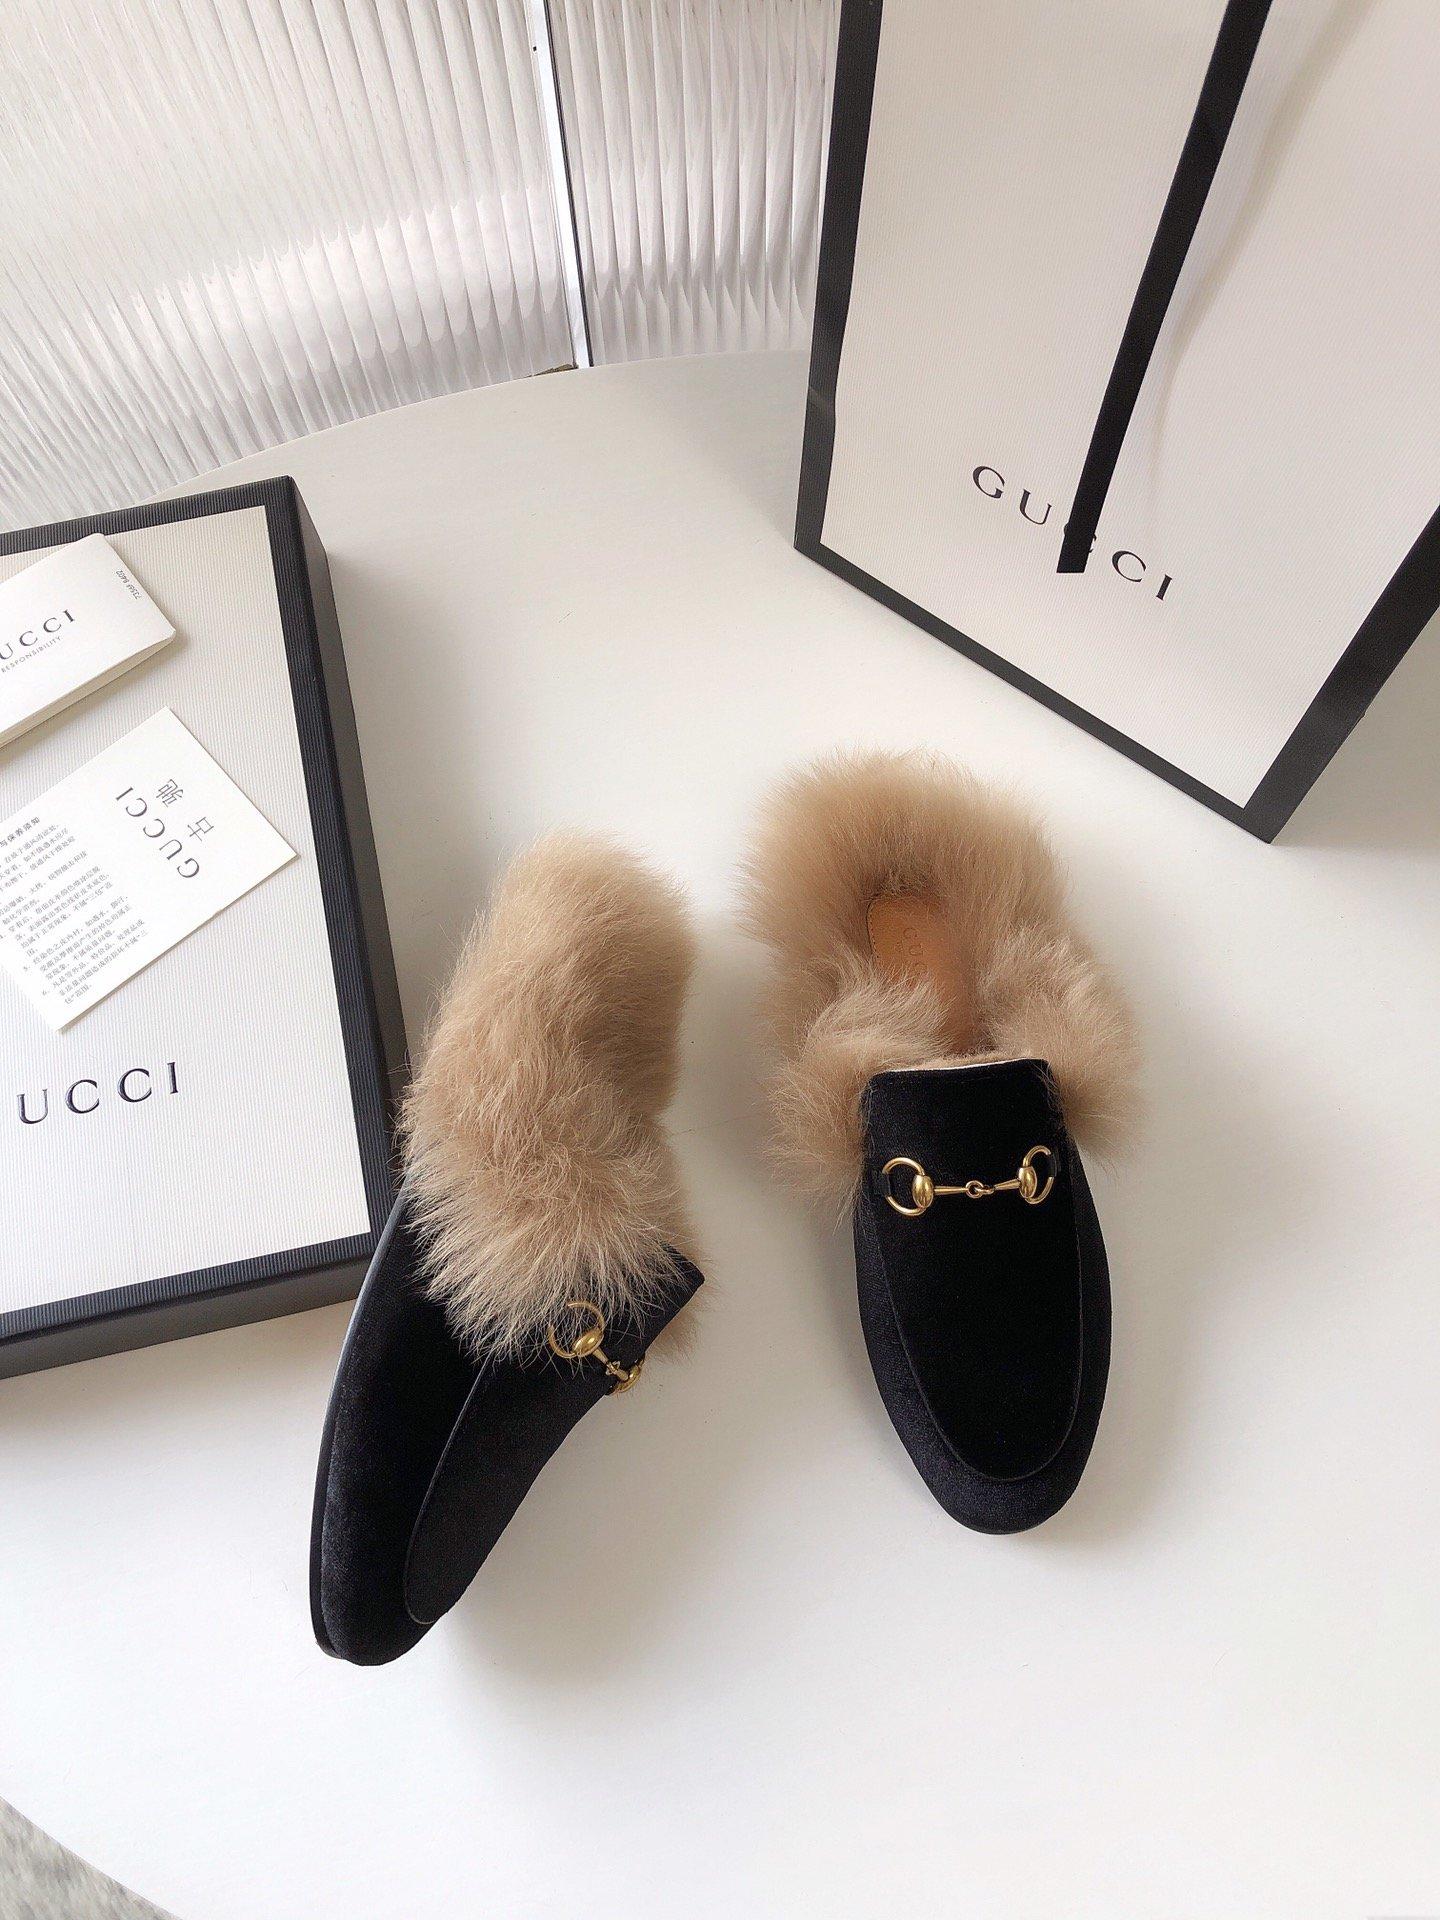 Gucci古奇 羔羊毛穆勒鞋高密度天鹅绒(图6)